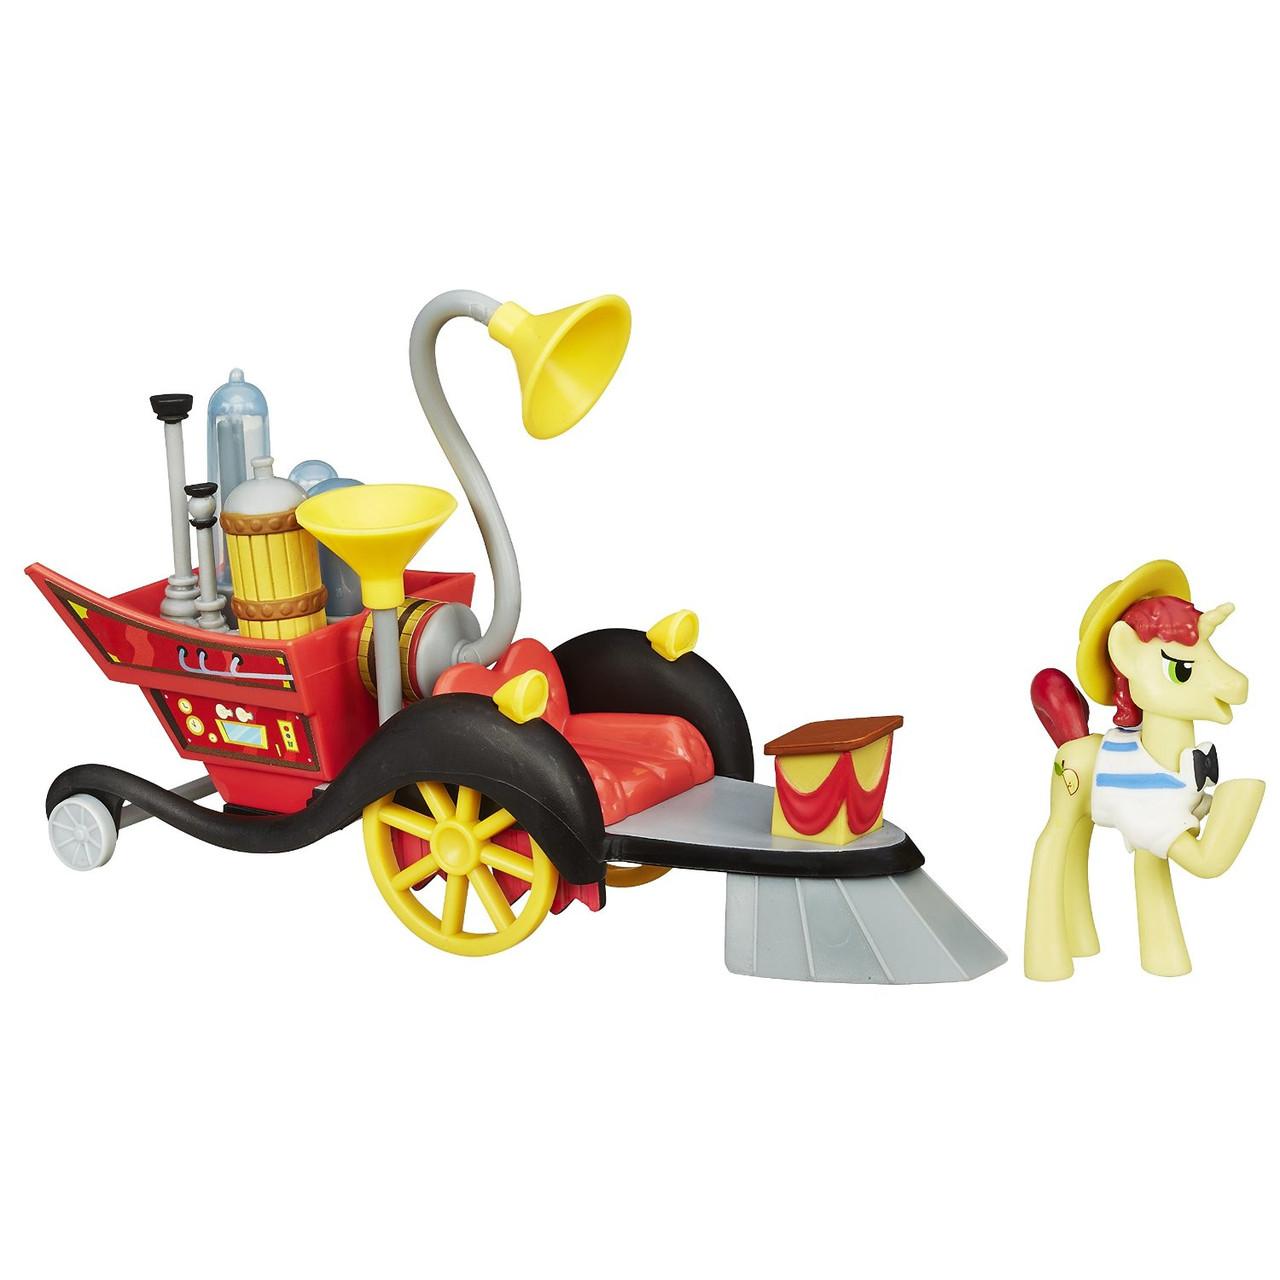 Май Литл Пони Супер-скоростная соковыжималка 6000 My Little Pony Friendship is Magic